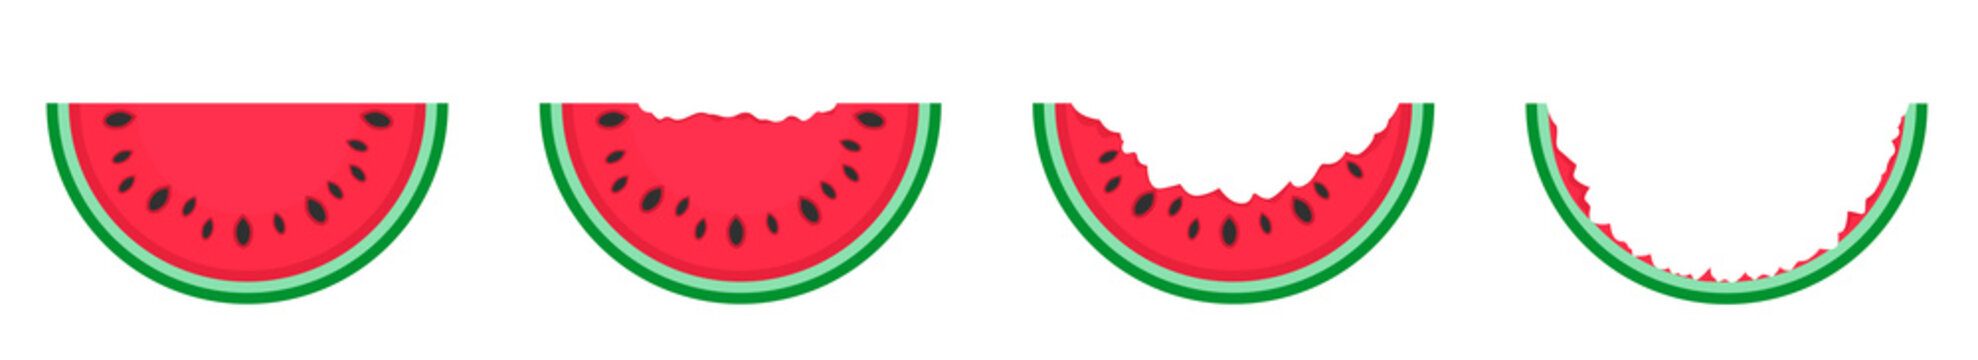 Cut Watermelon set